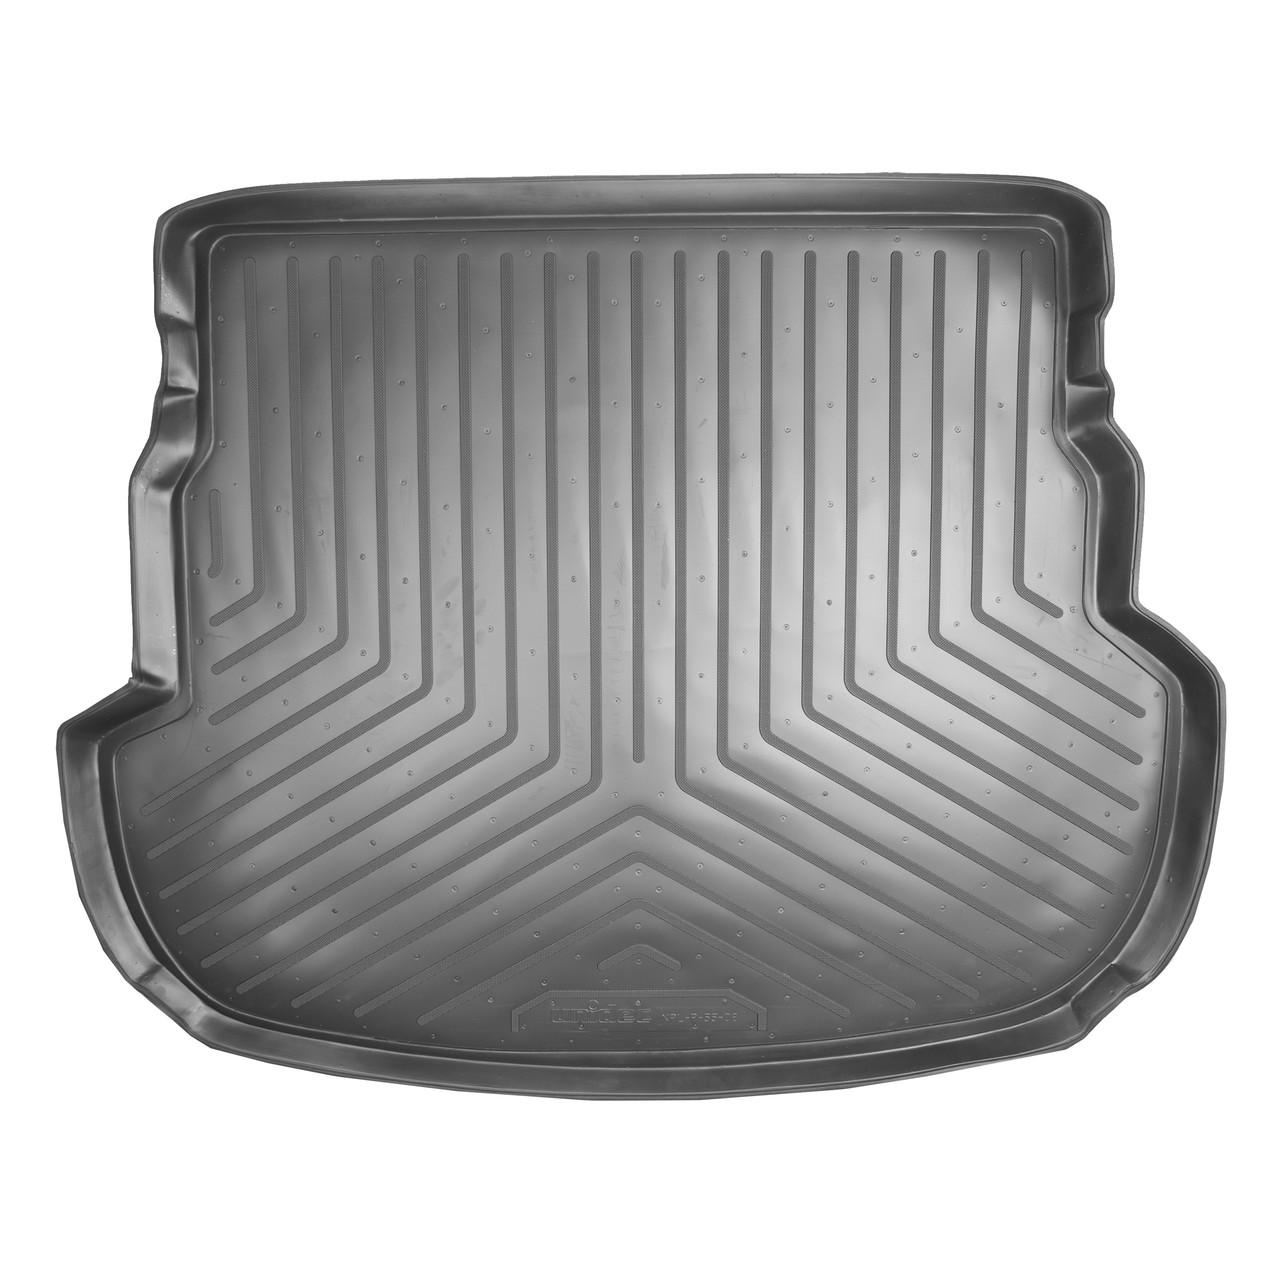 Коврик в багажник Mazda 6 WAG (2002-2007)